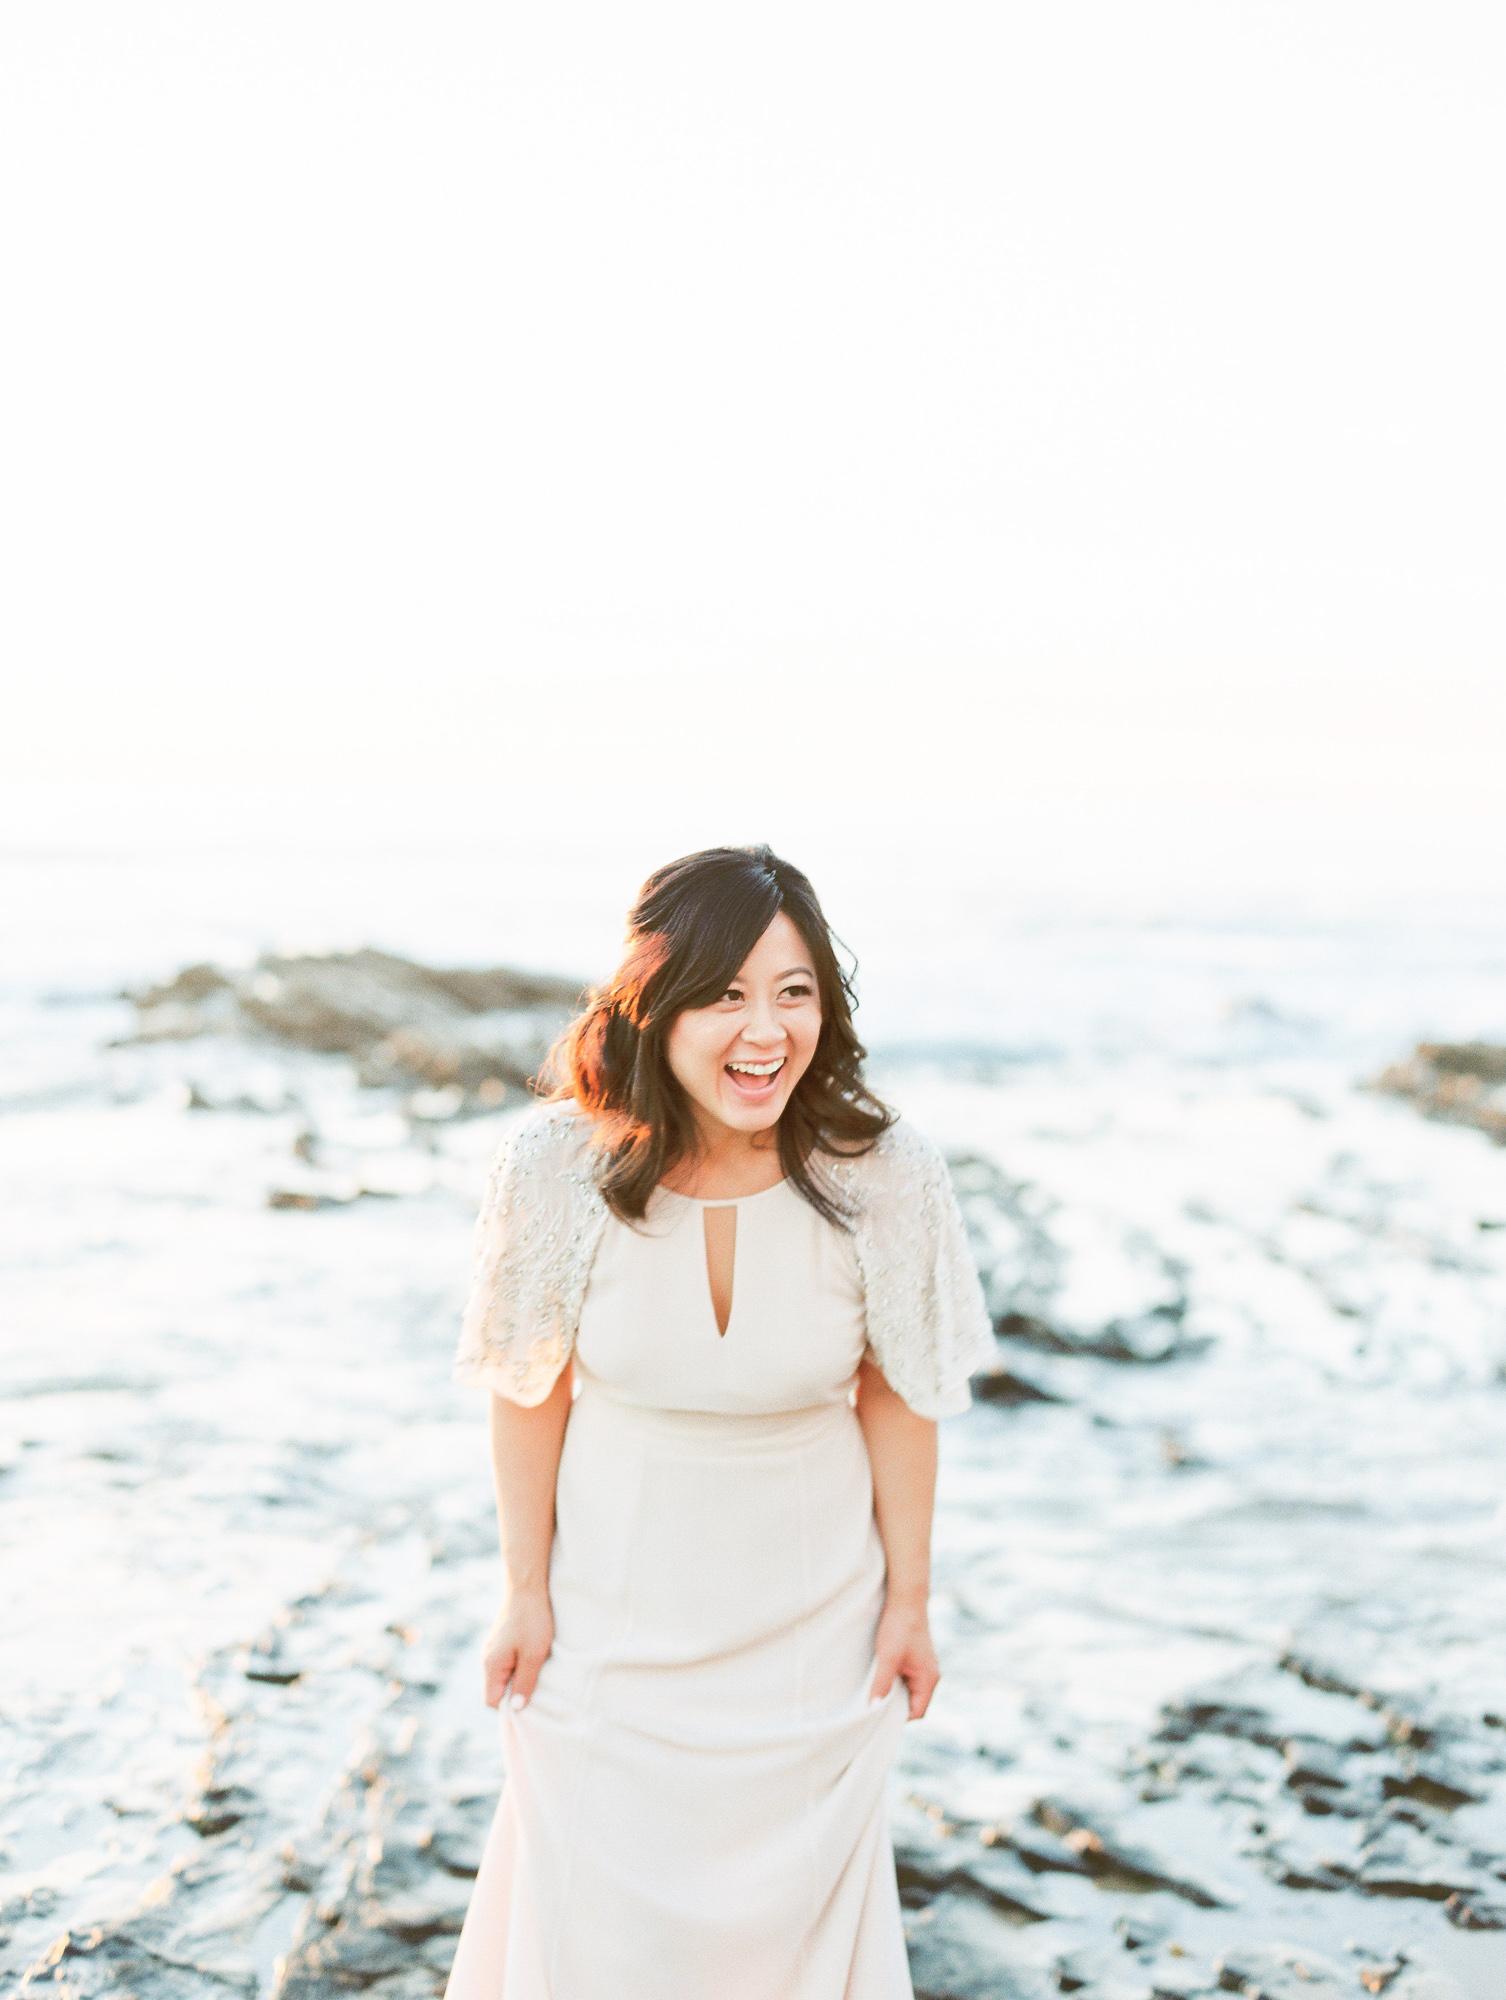 Crystal-Cove-Engagement-Kristina-Adams-21.jpg